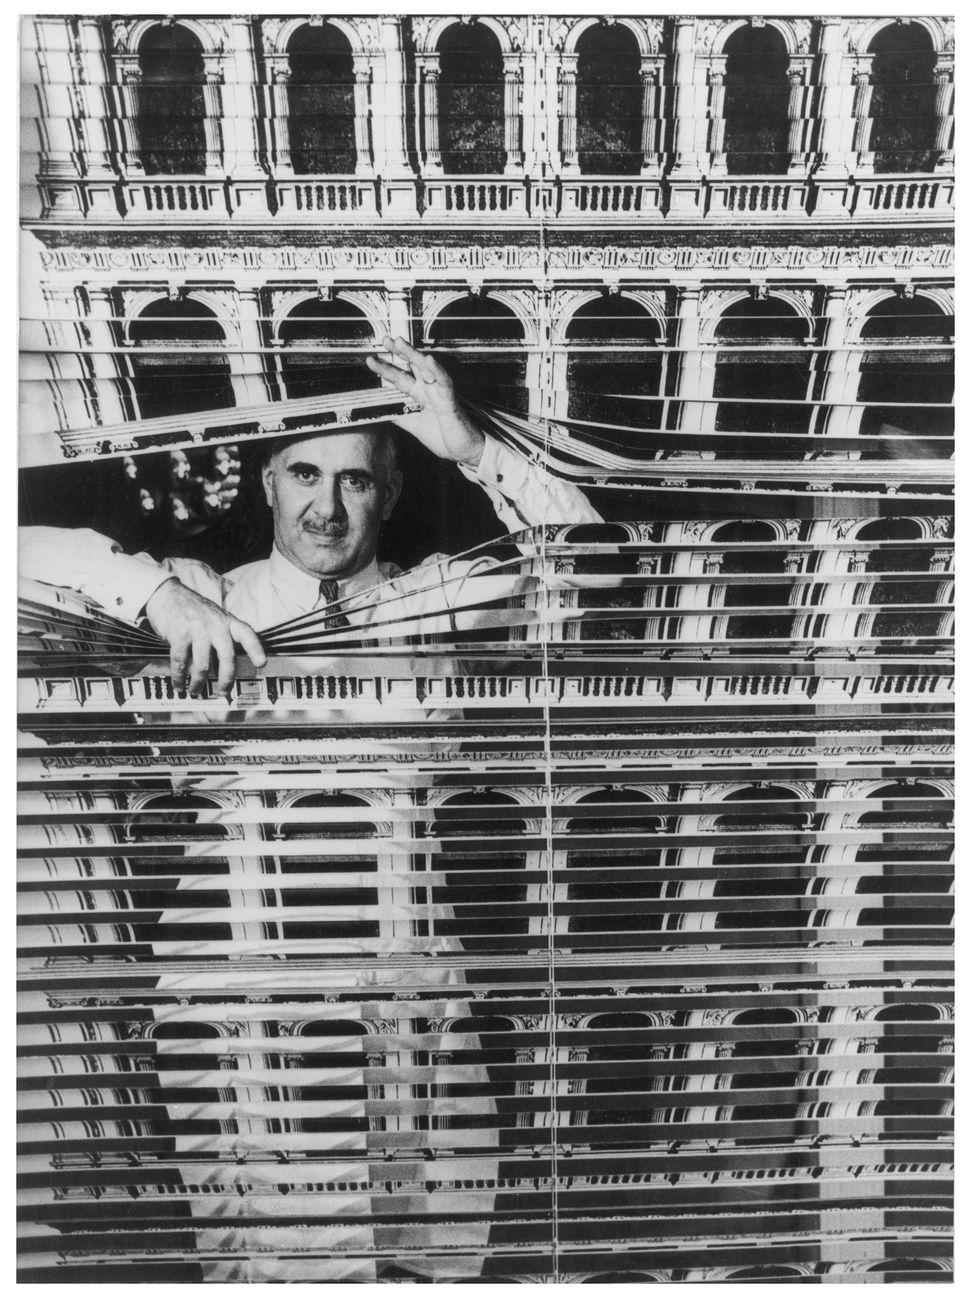 Piero Fornasetti. Photo credit Ugo Mulas